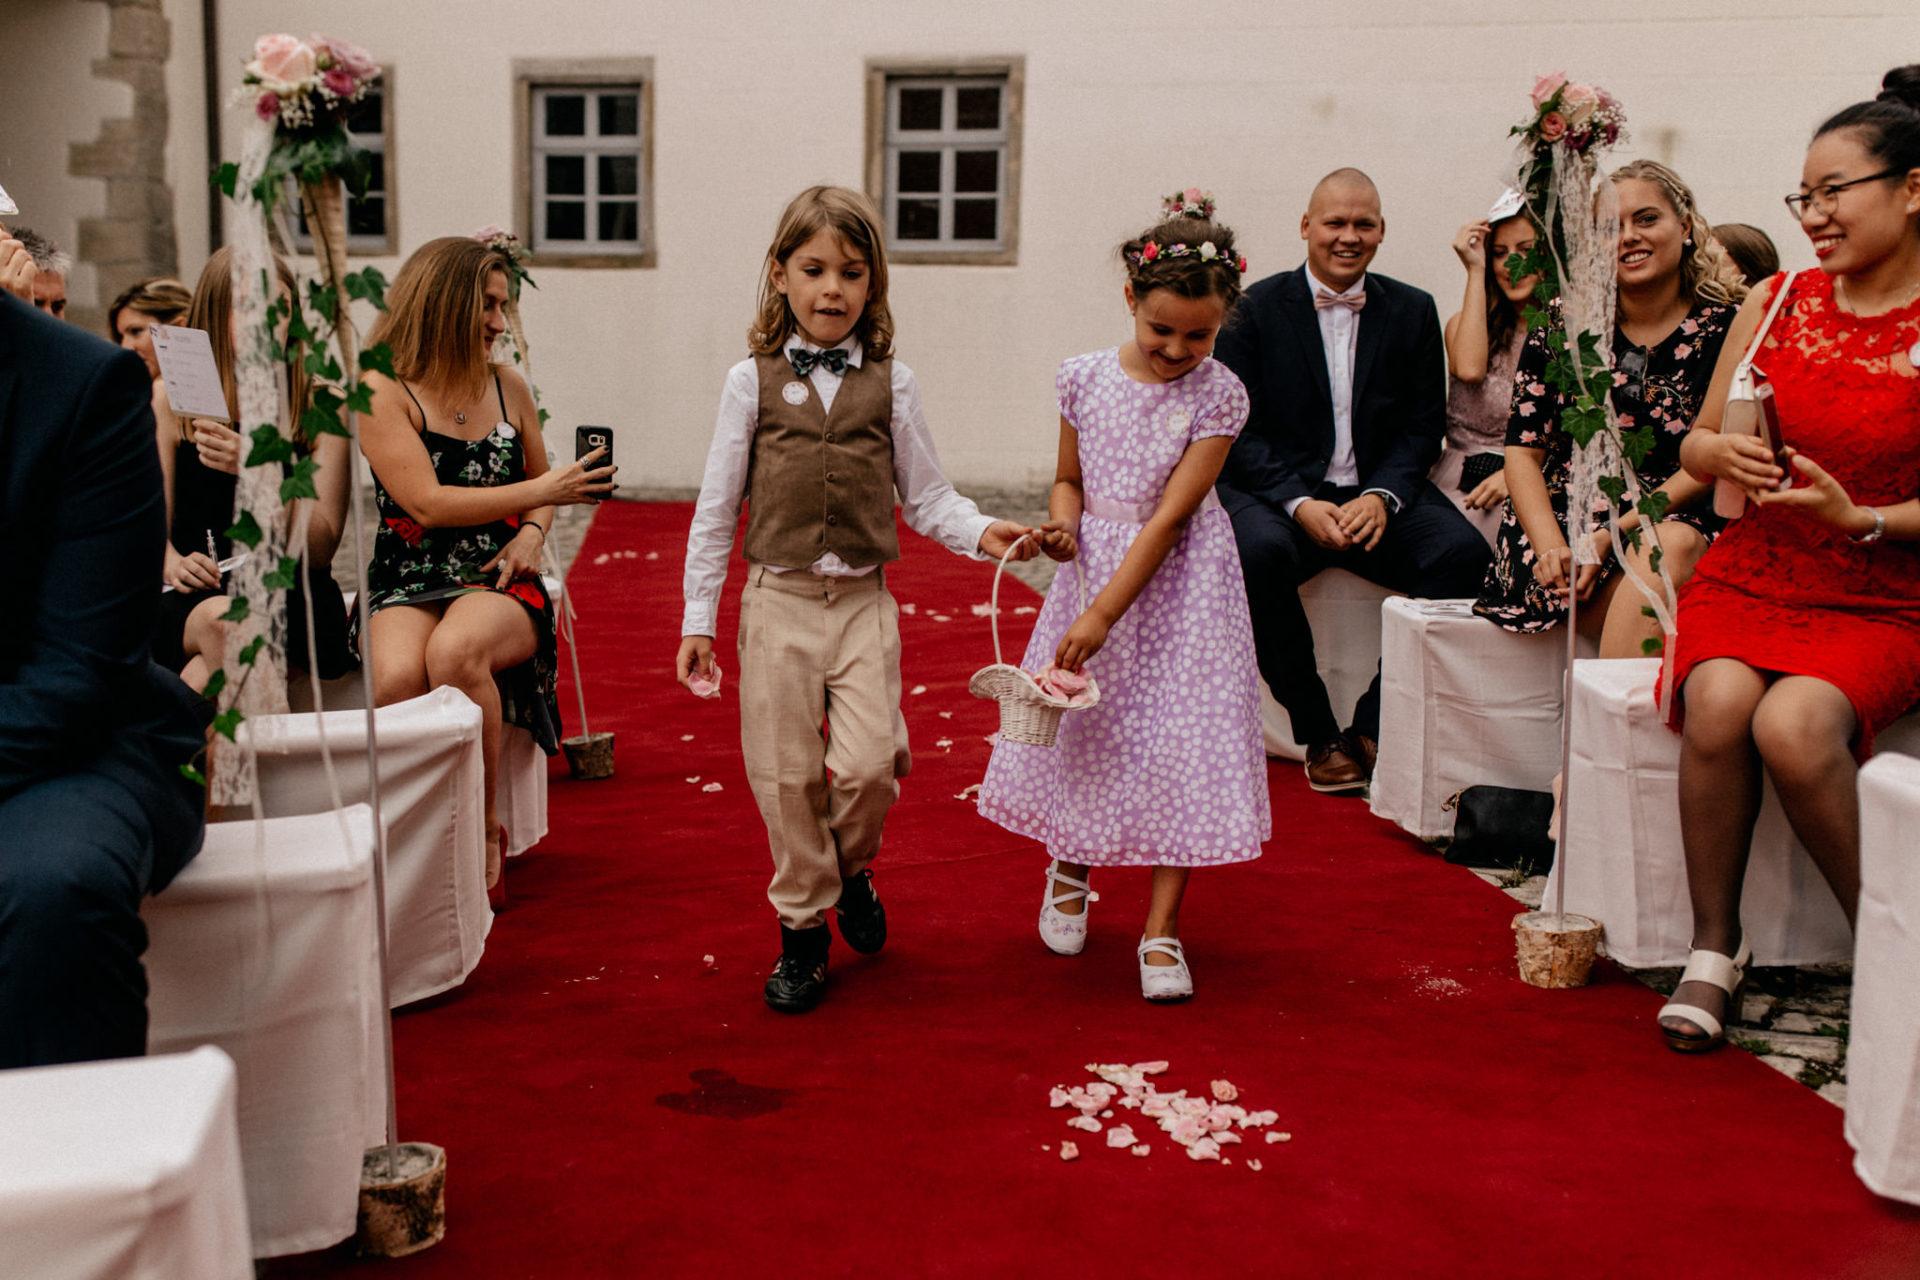 wedding photographer suttgart-reception water castle Erkenbrechtshausen Crailsheim-wedding ceremony outdoor summer rain-flower girl